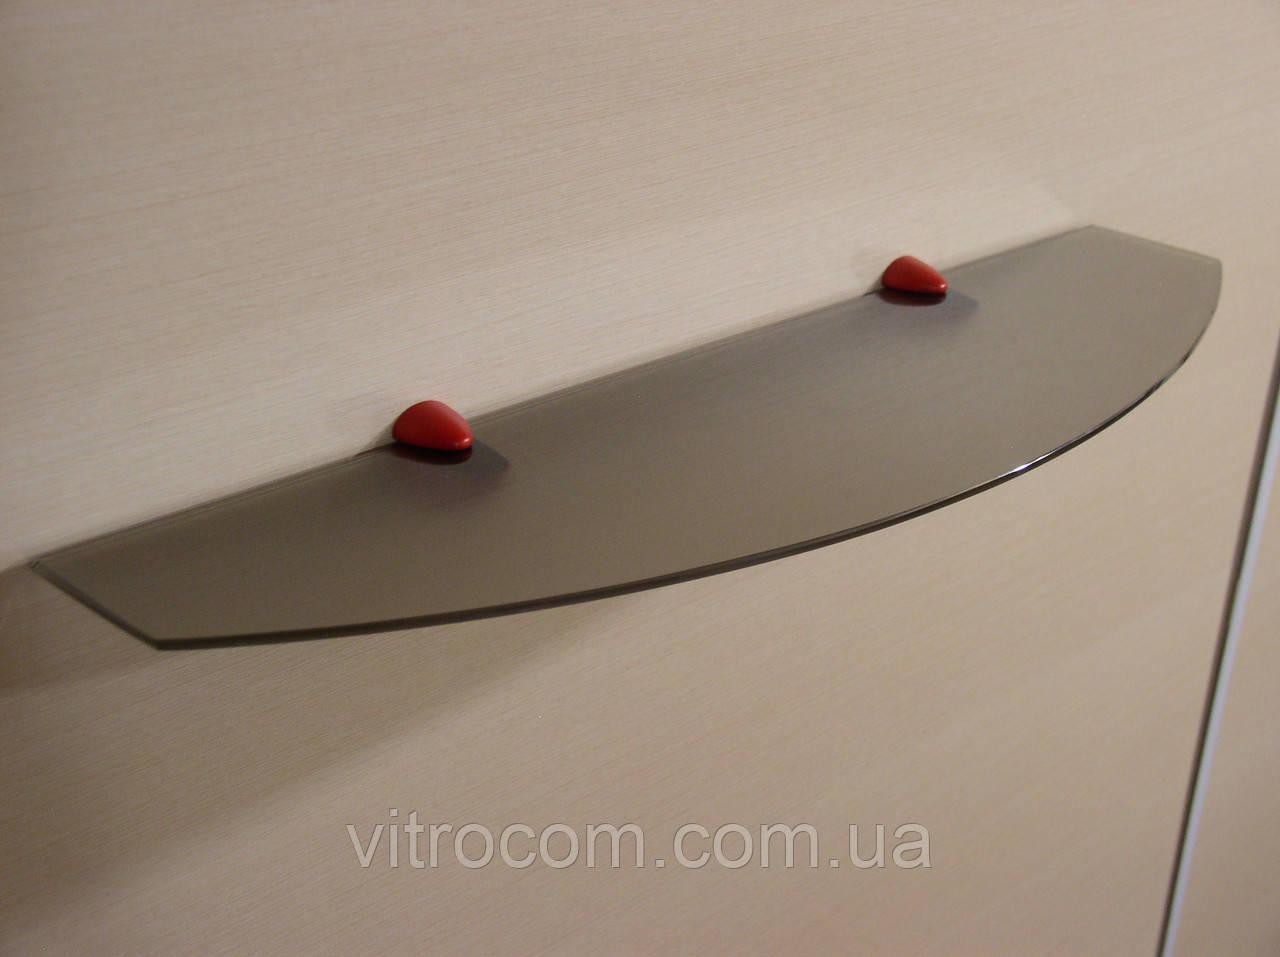 Полка стеклянная фигурная 4 мм бронзовая матовая 55 х 15 см